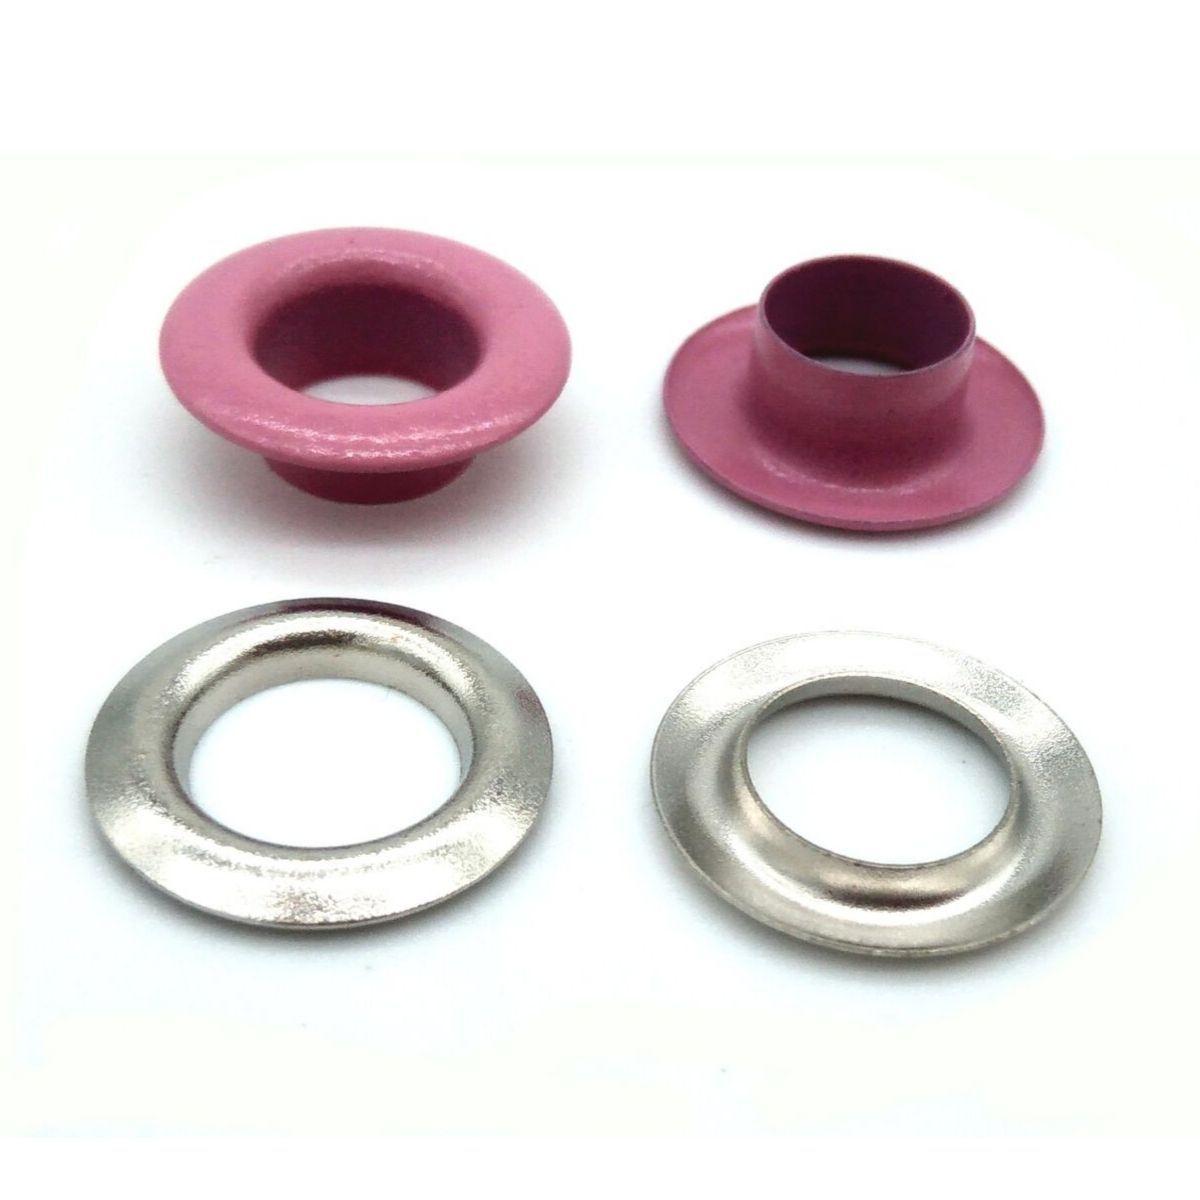 Ilhós com Arruela Ferro Rosa Nº 45 15mm de diâmetro externo